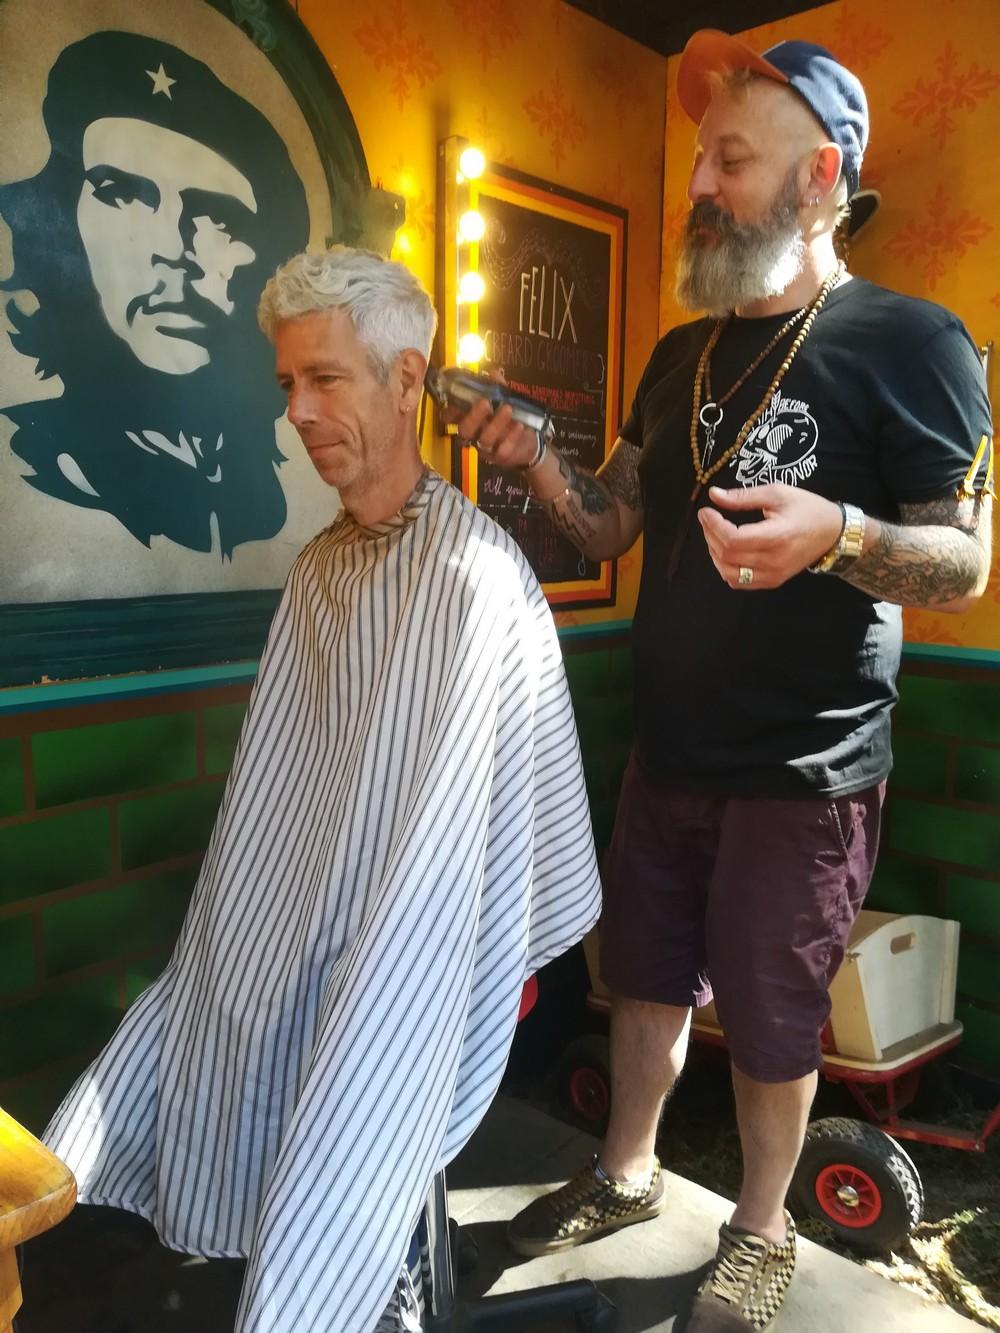 Latitude 2018 - Haircut by Felix of the Saboteurs